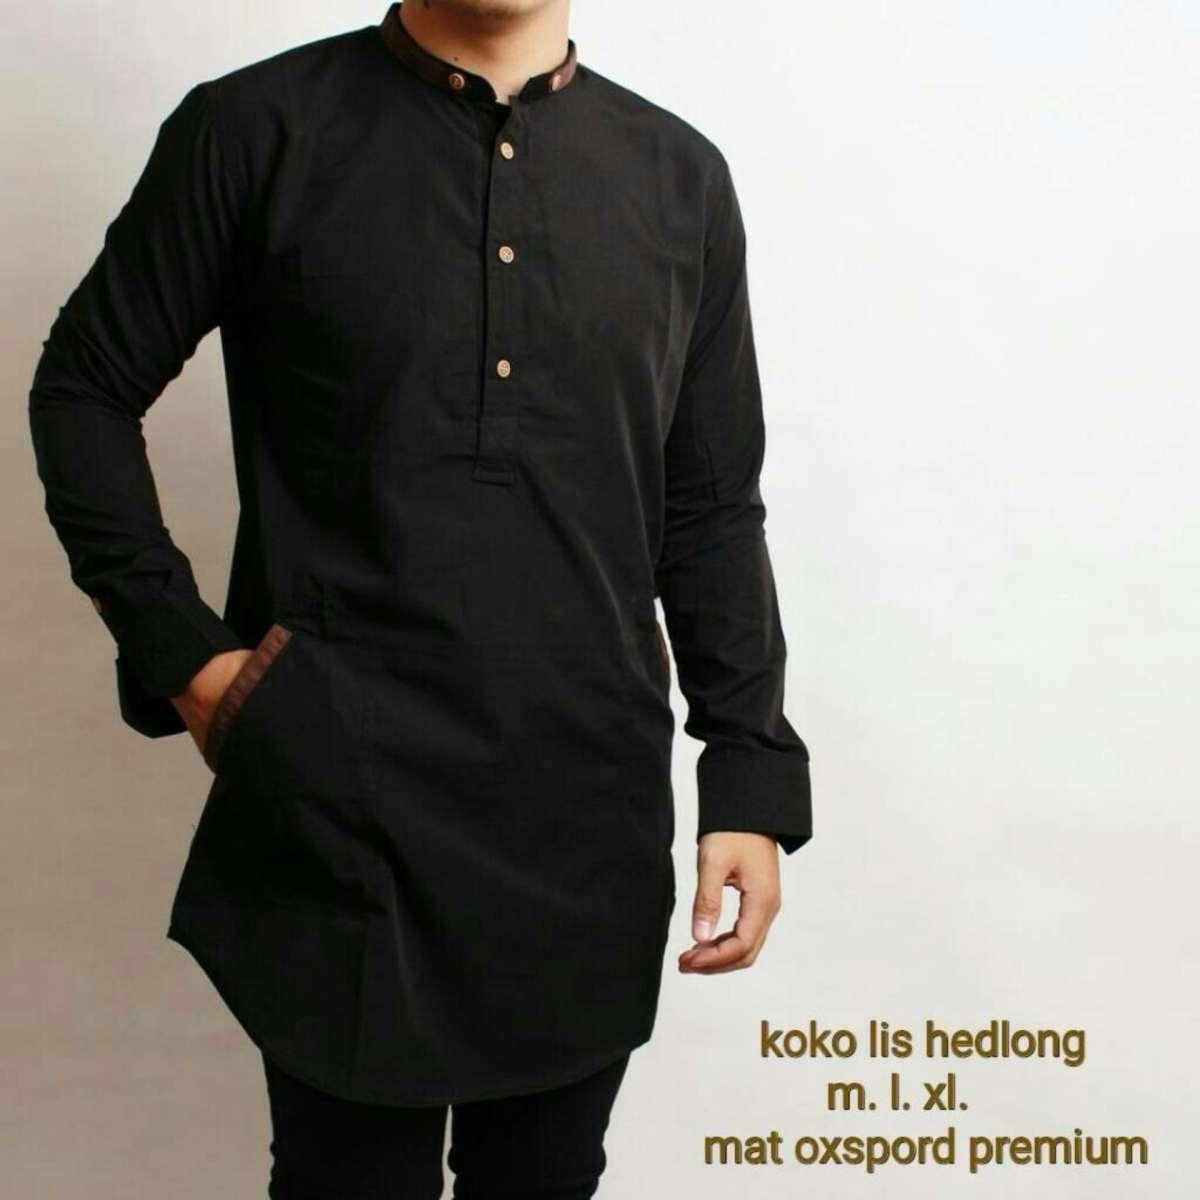 Batik Bordir Lengan Pendek Lebaran Hari Raya Pengajian ZO17 KK85 Kemeja Fashion SHOHIB Baju Koko Kemeja